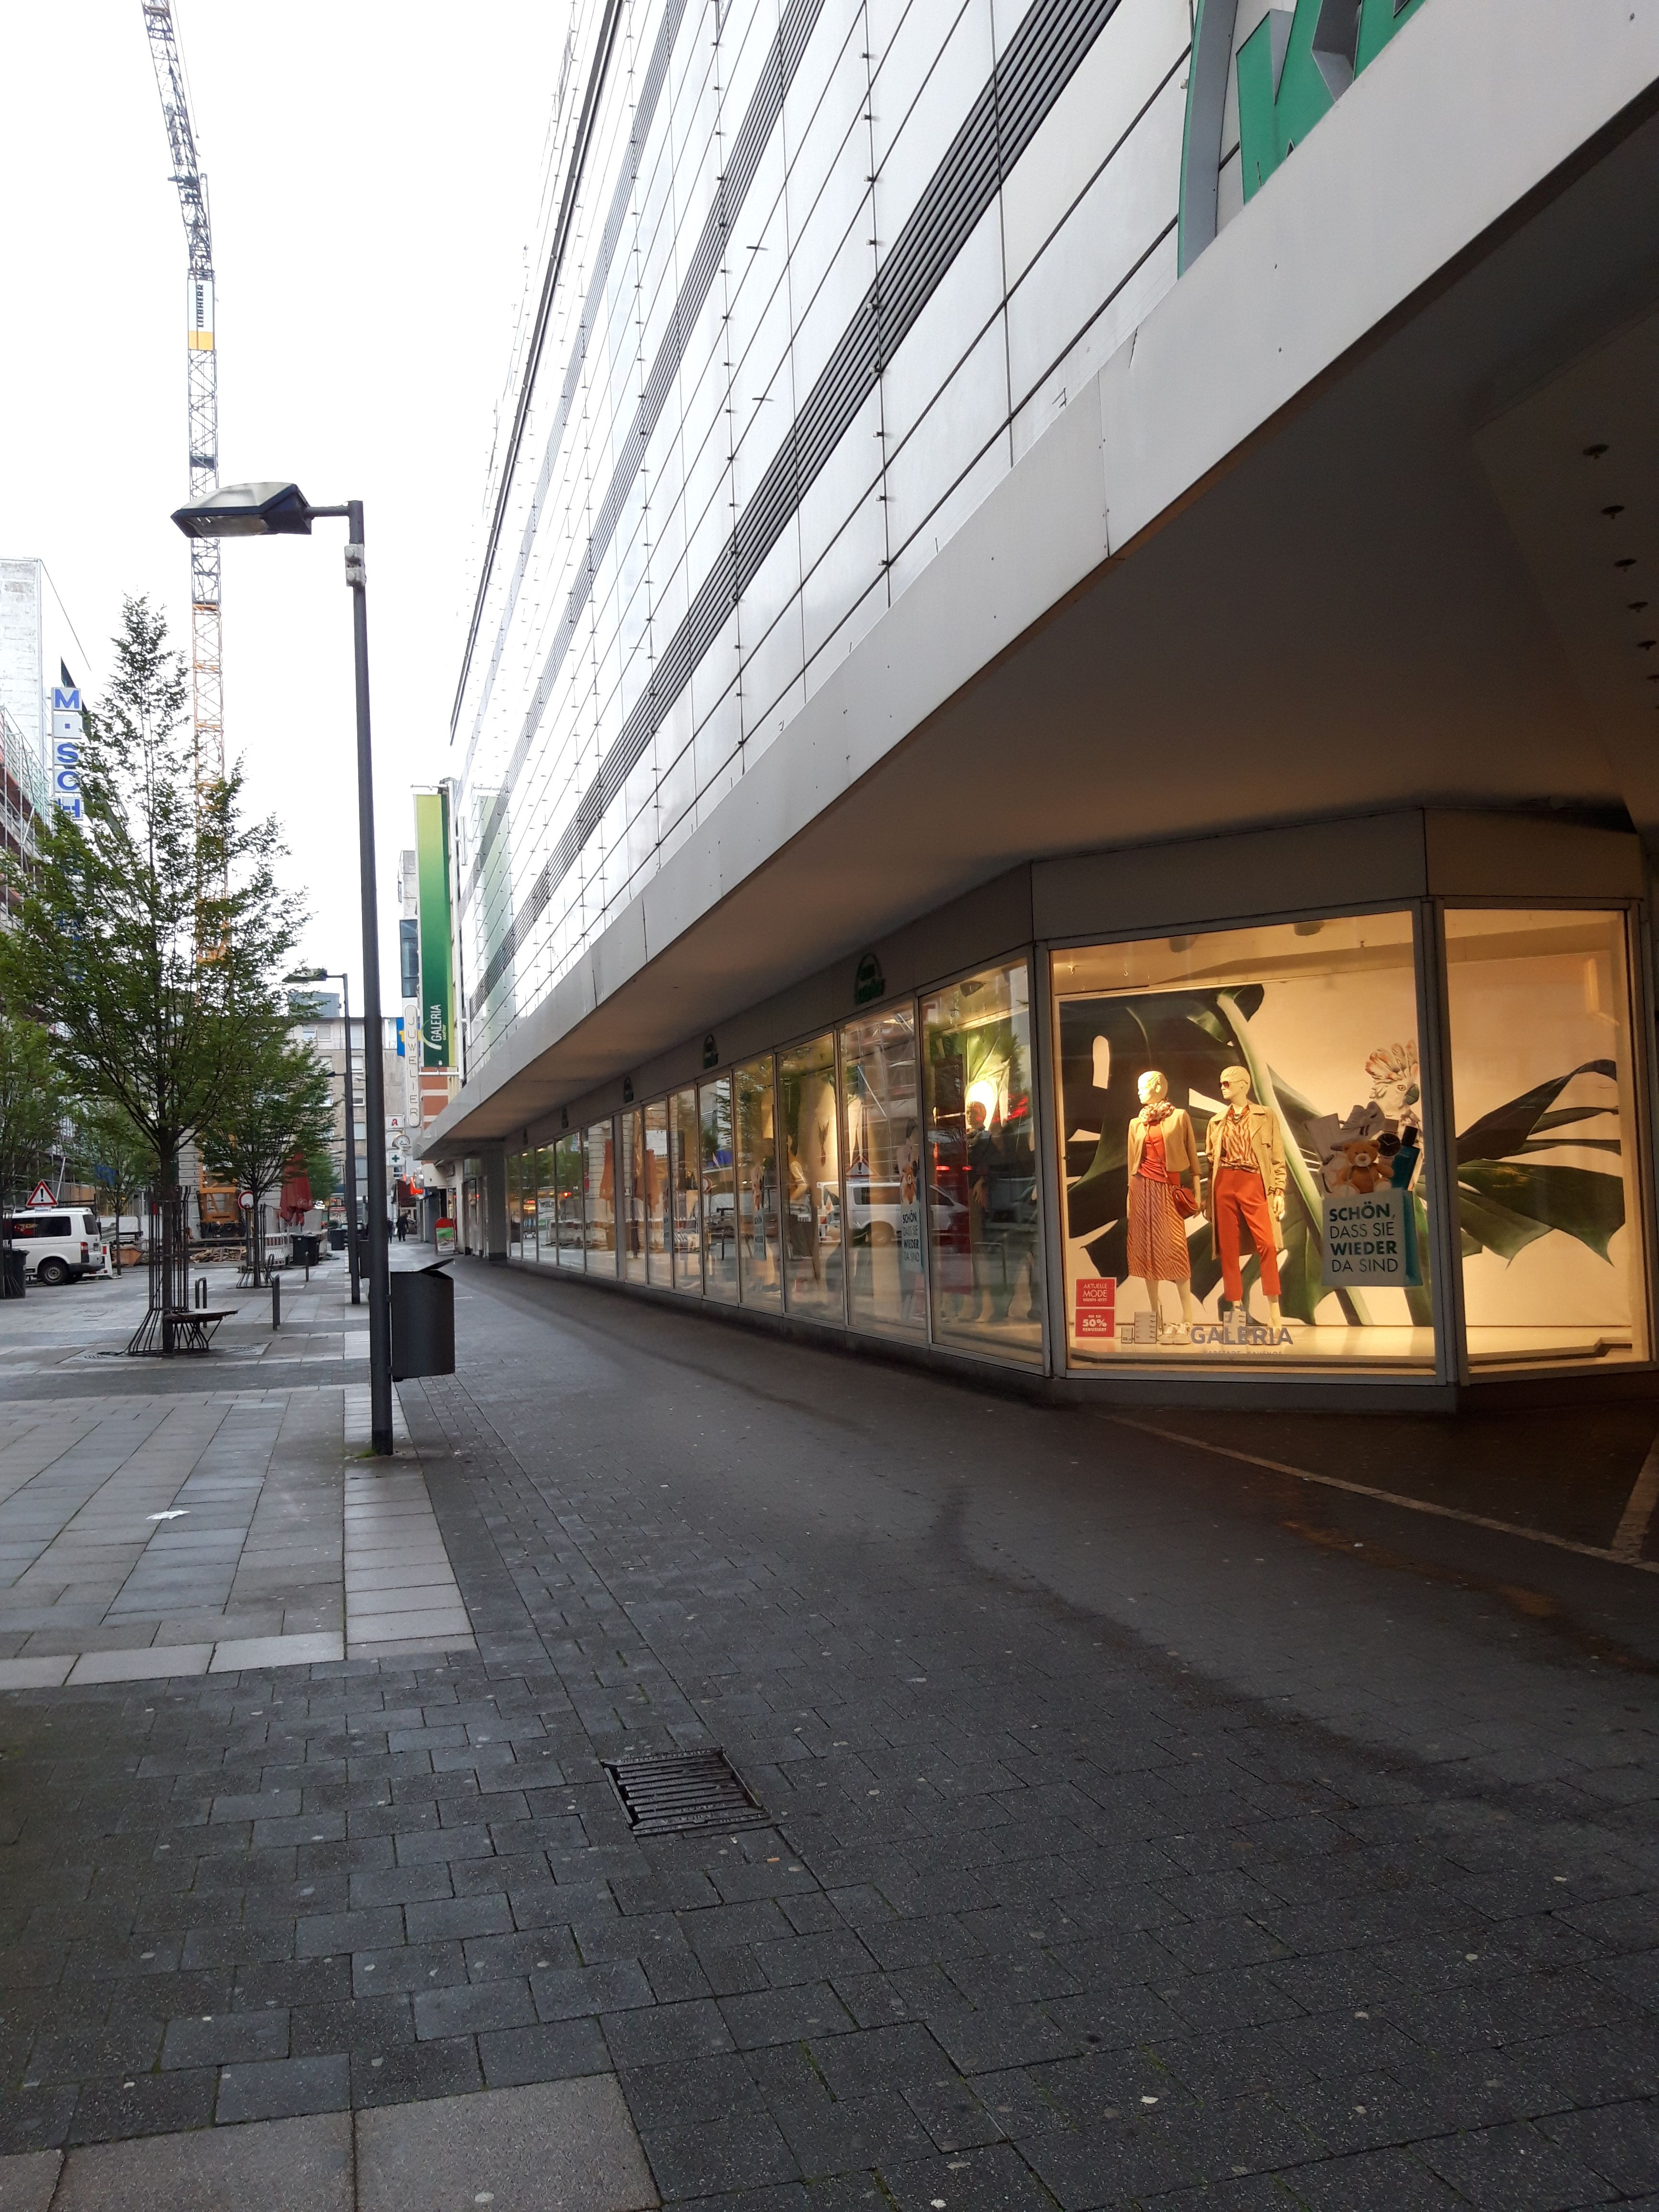 Offenbach Am Main Handy In 2020 Offenbach Am Main Maine Umgebung